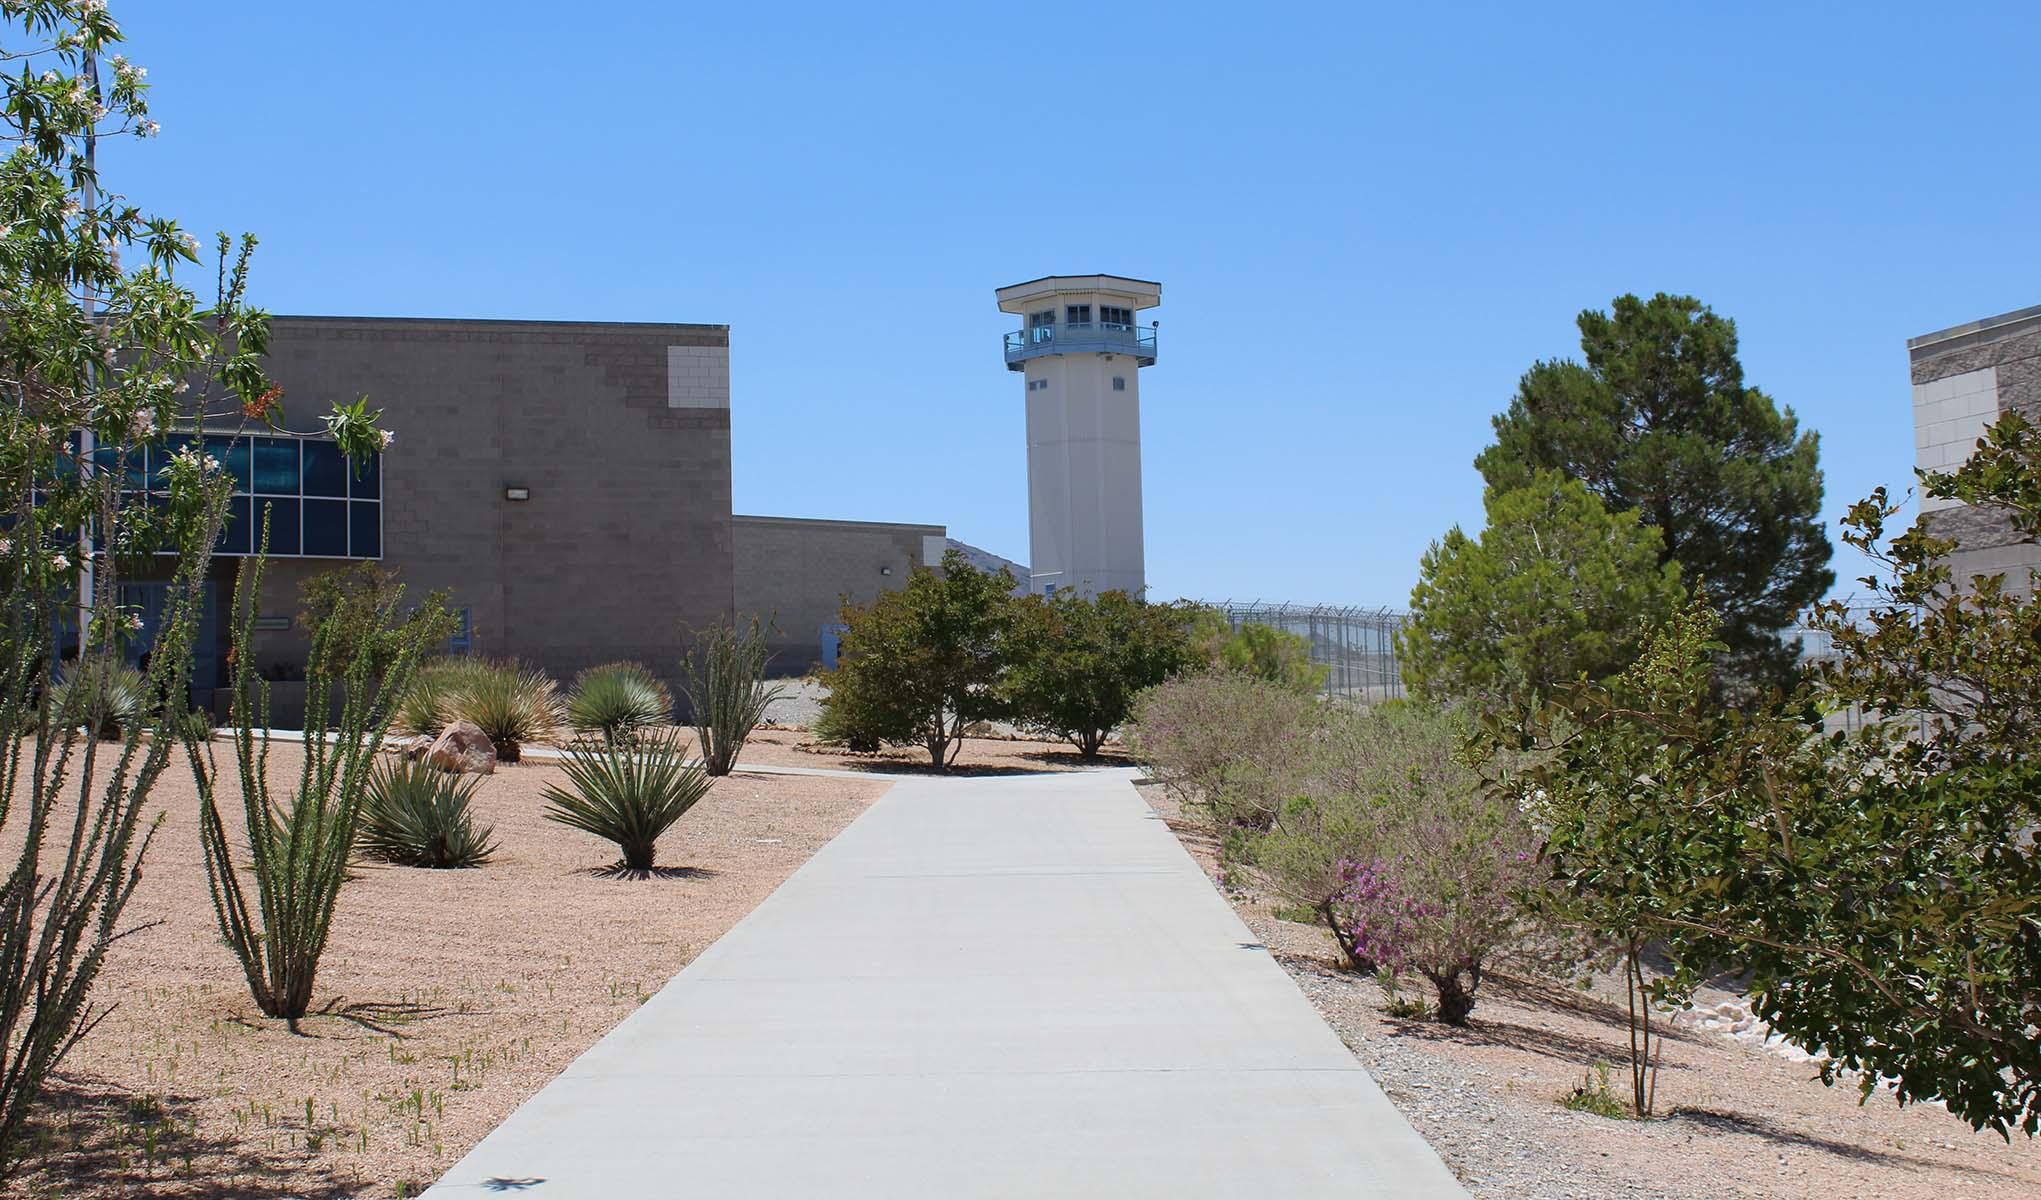 High Desert State Prison